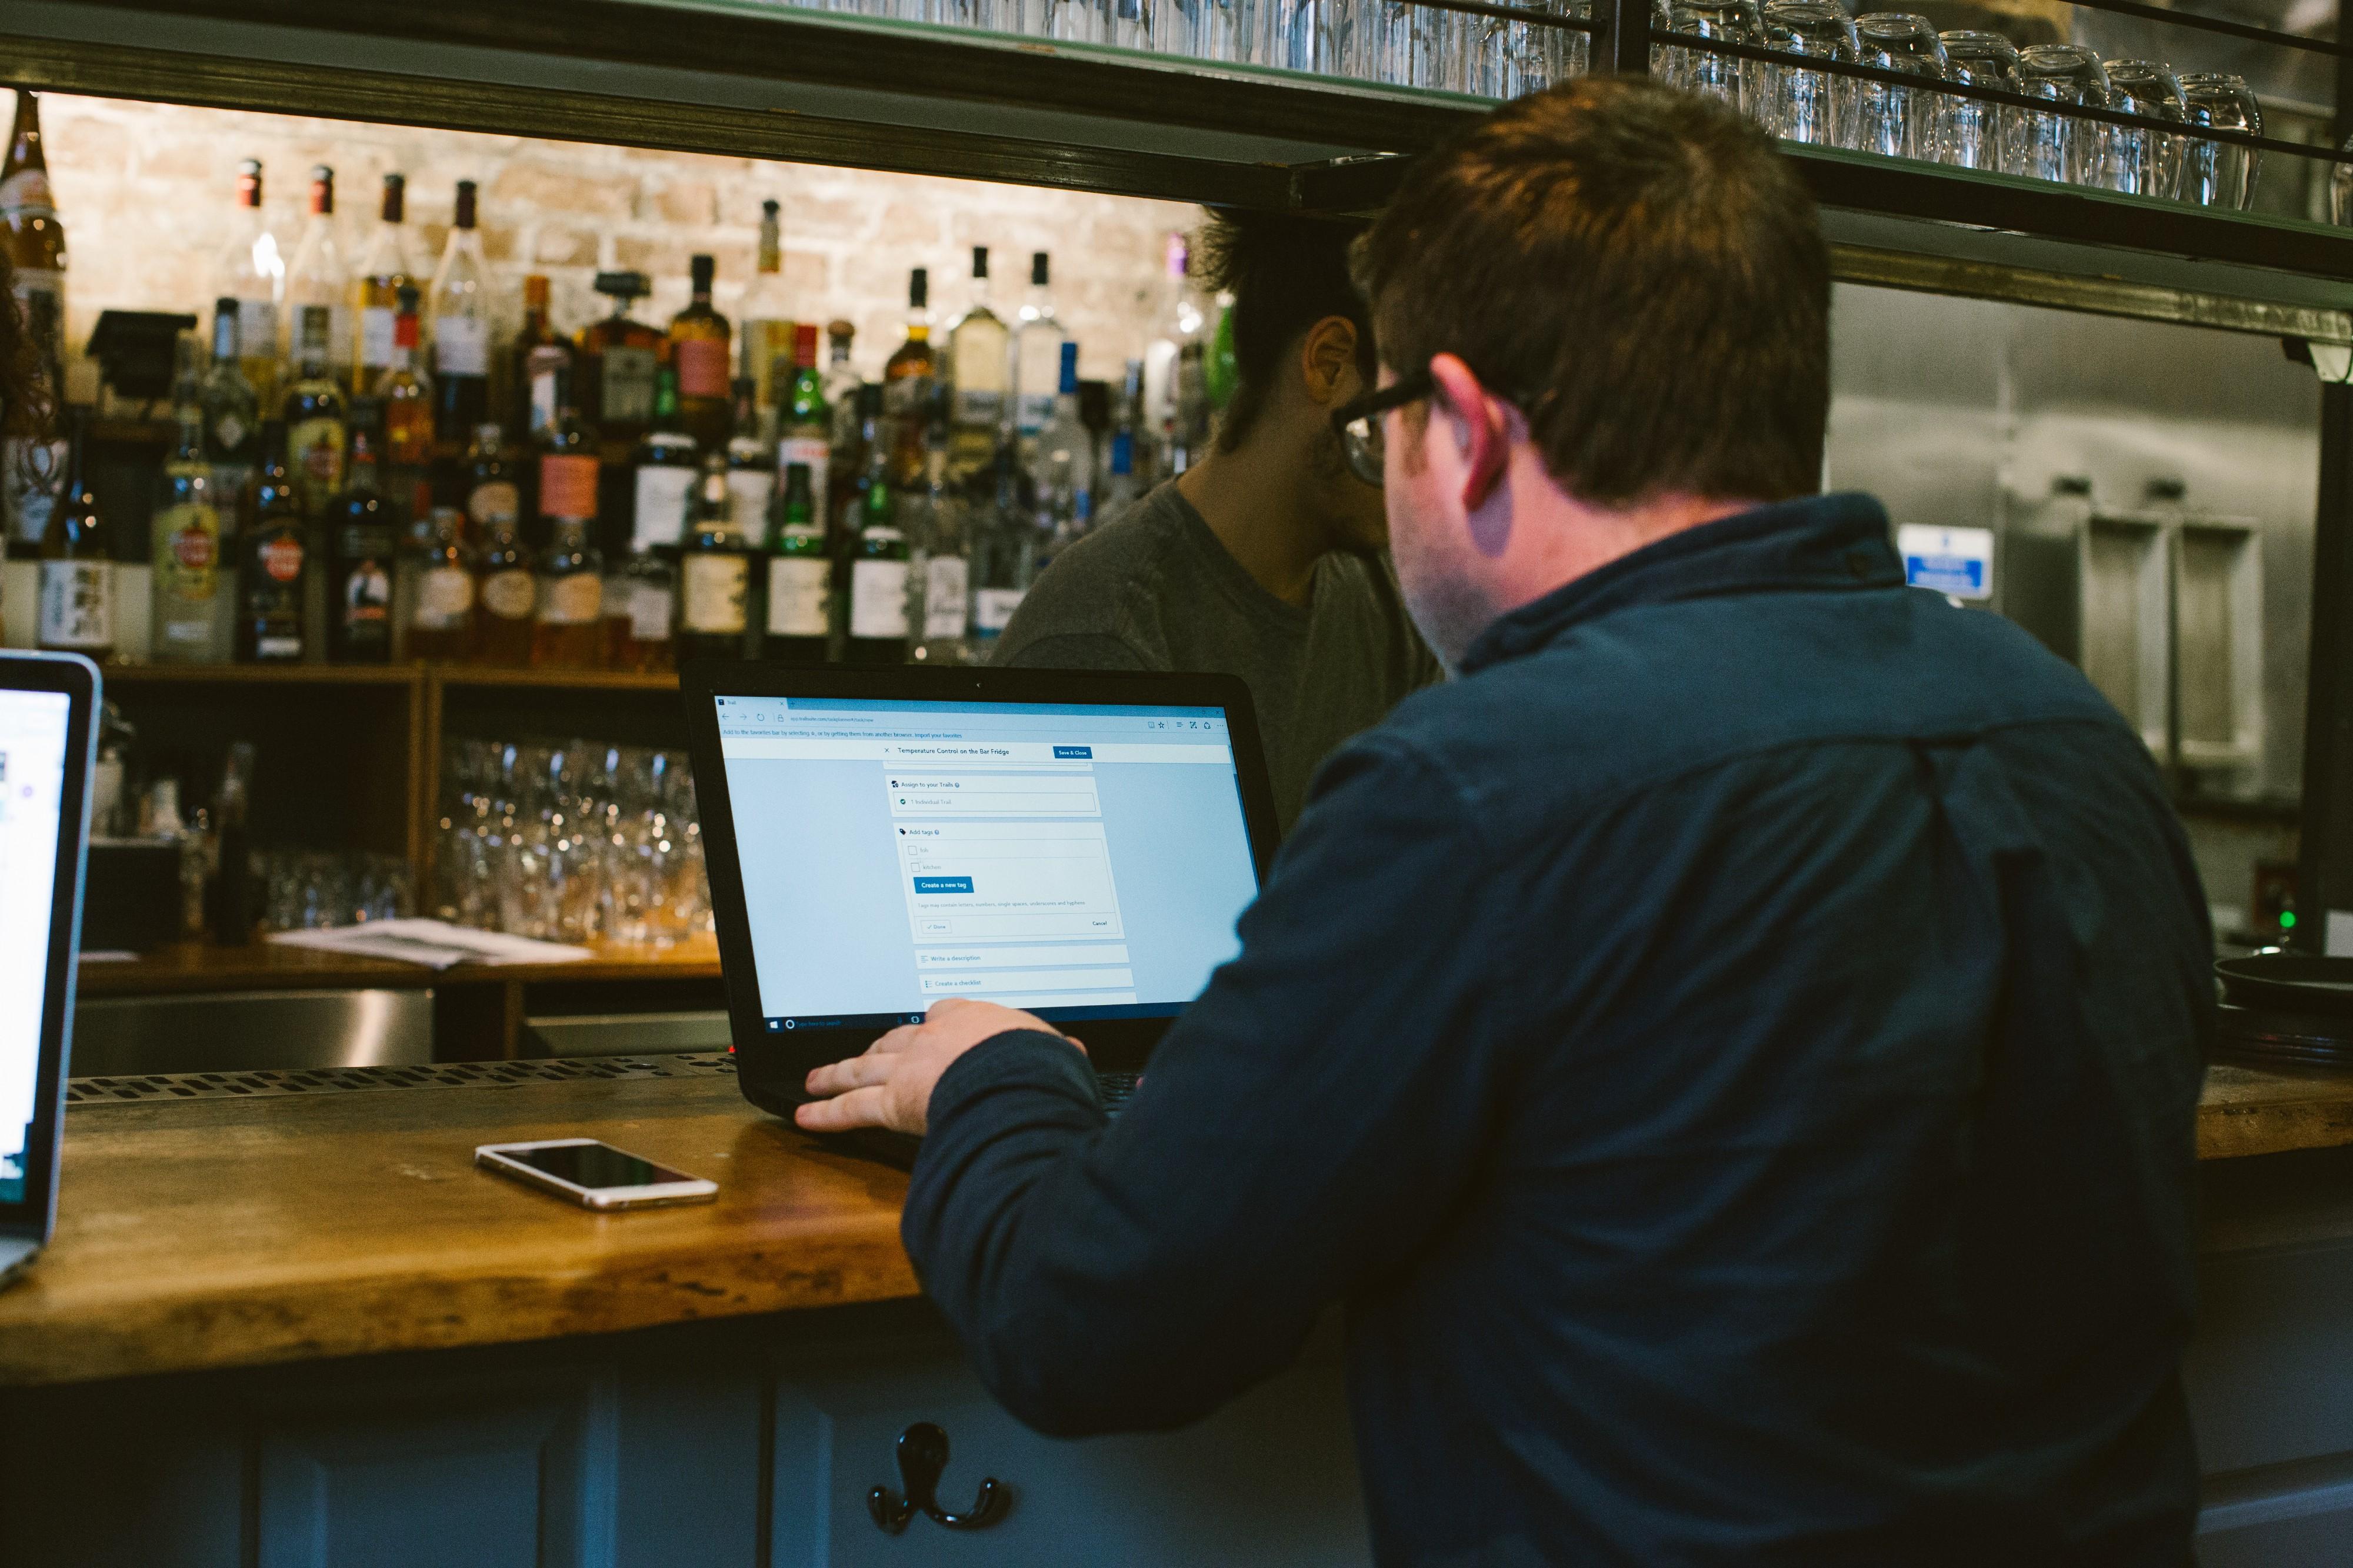 Restaurant manager using Trail on desktop